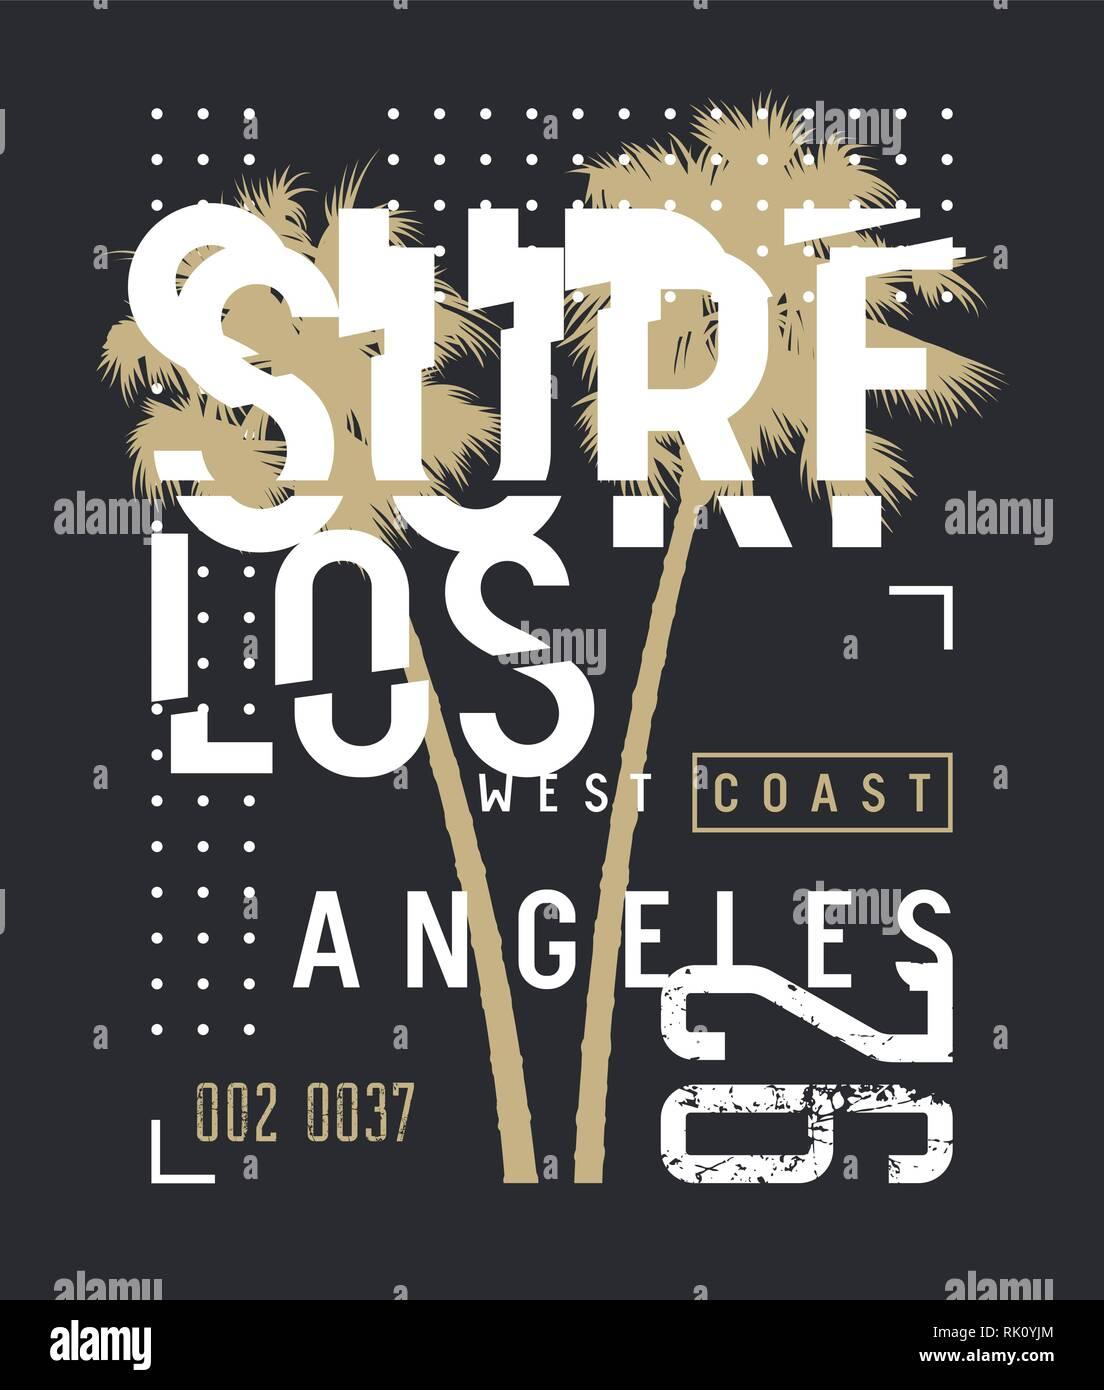 a317df78c1ddd Surf California t-shirt and apparel design. Surfing artwork. Trendy ...